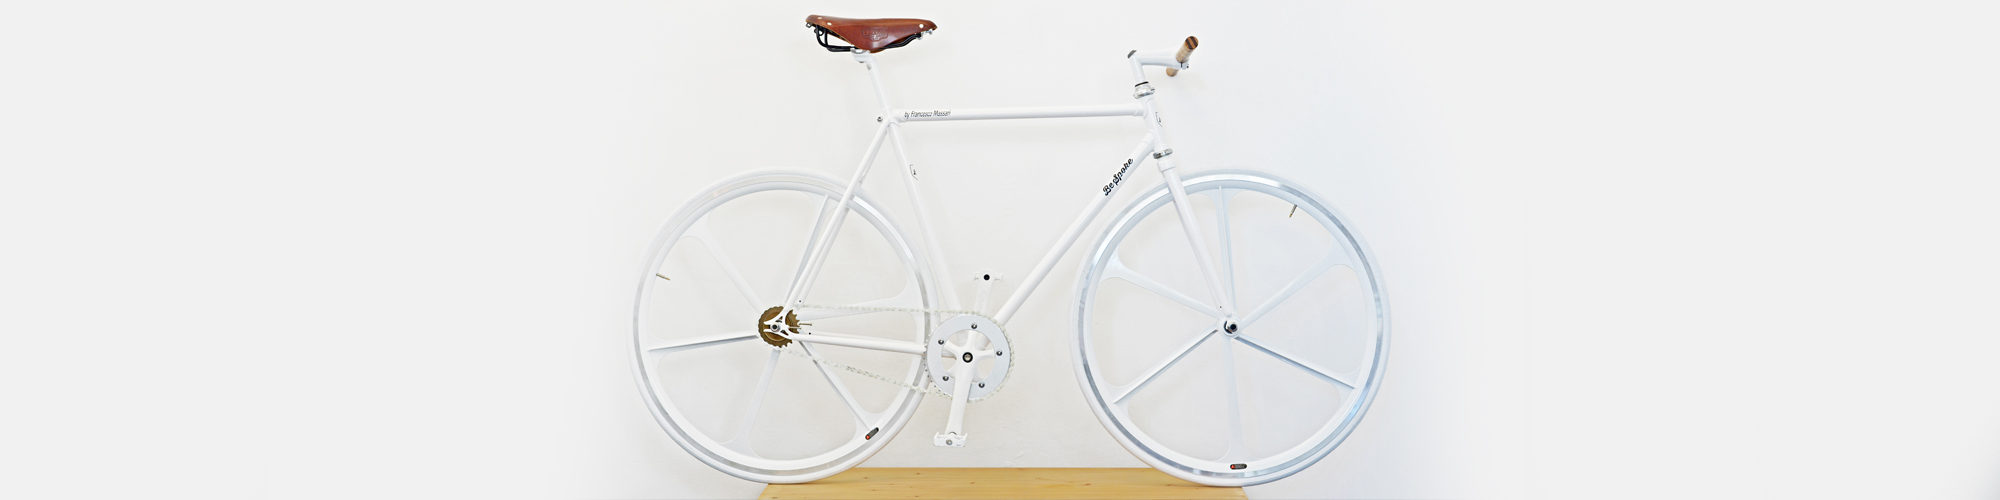 Bespoke-bike4